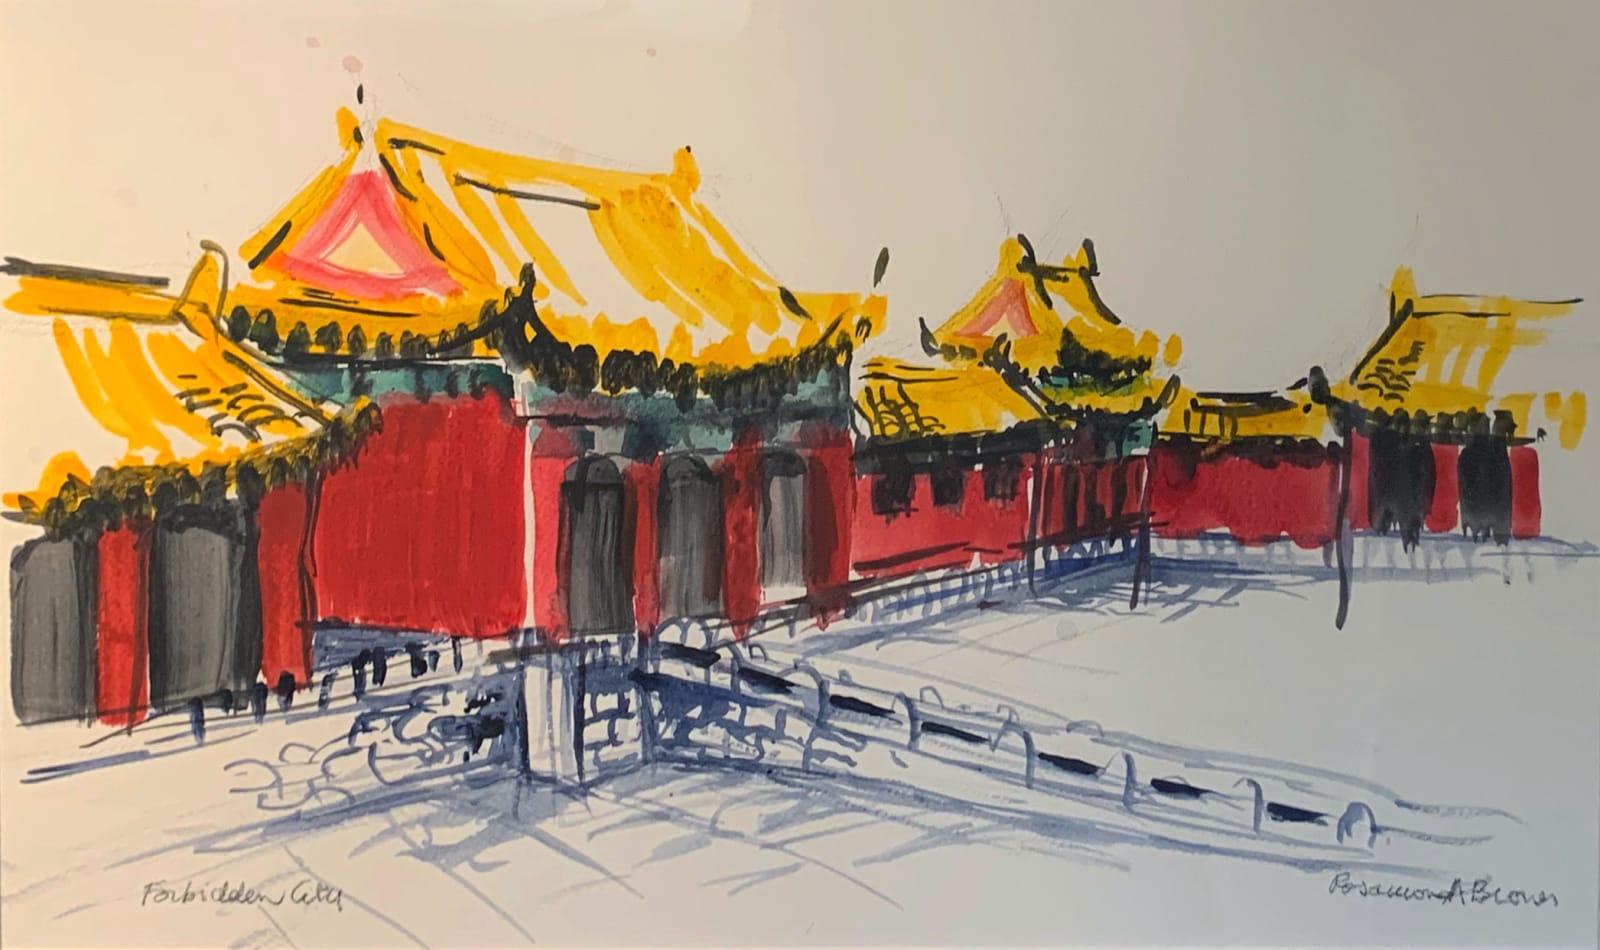 Rosamond Brown, Forbidden City, 2020